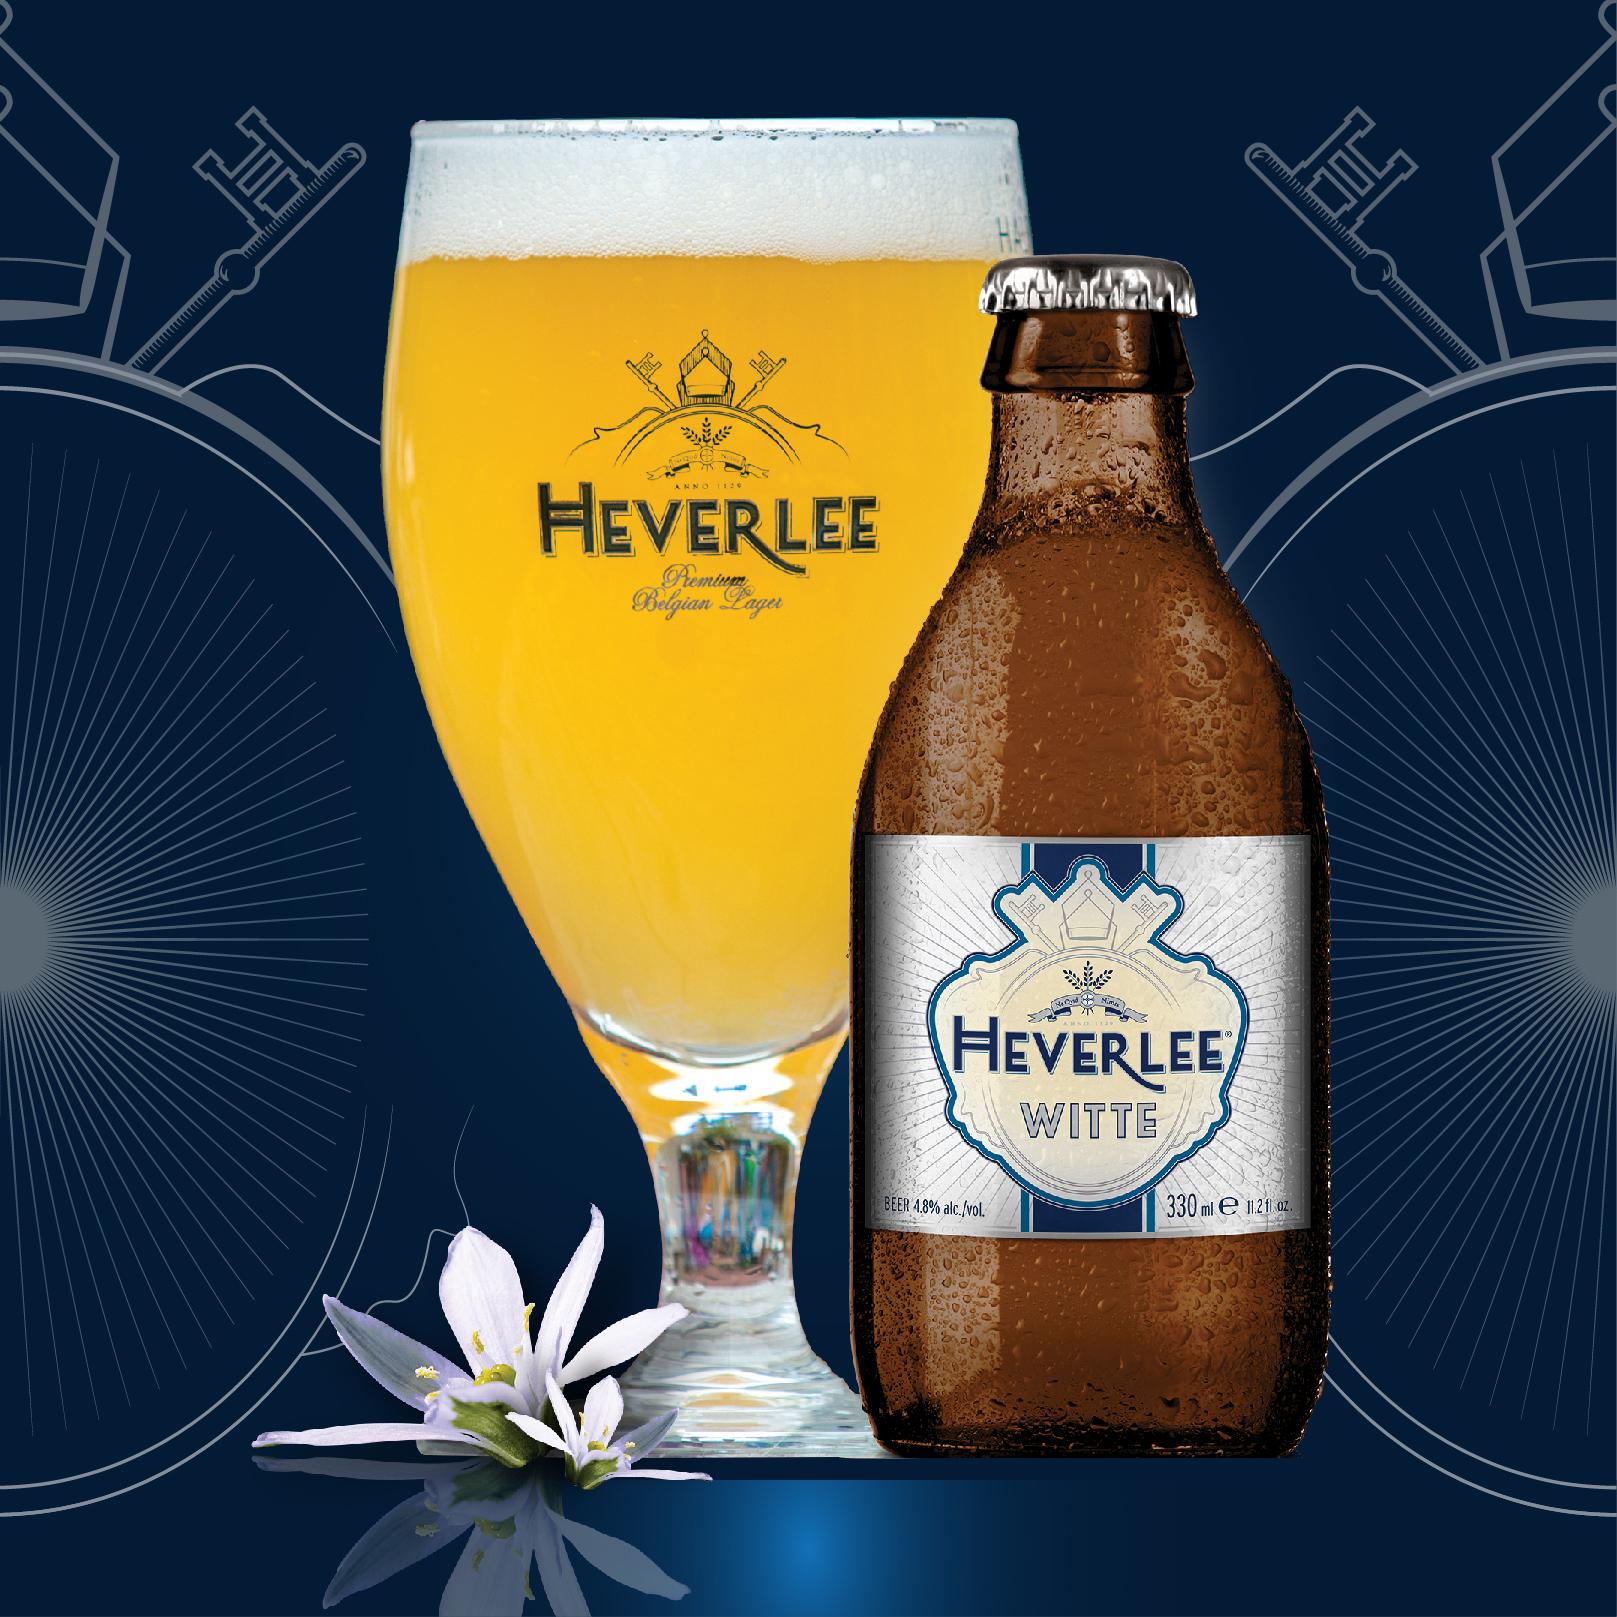 HEVERLEE-01-1